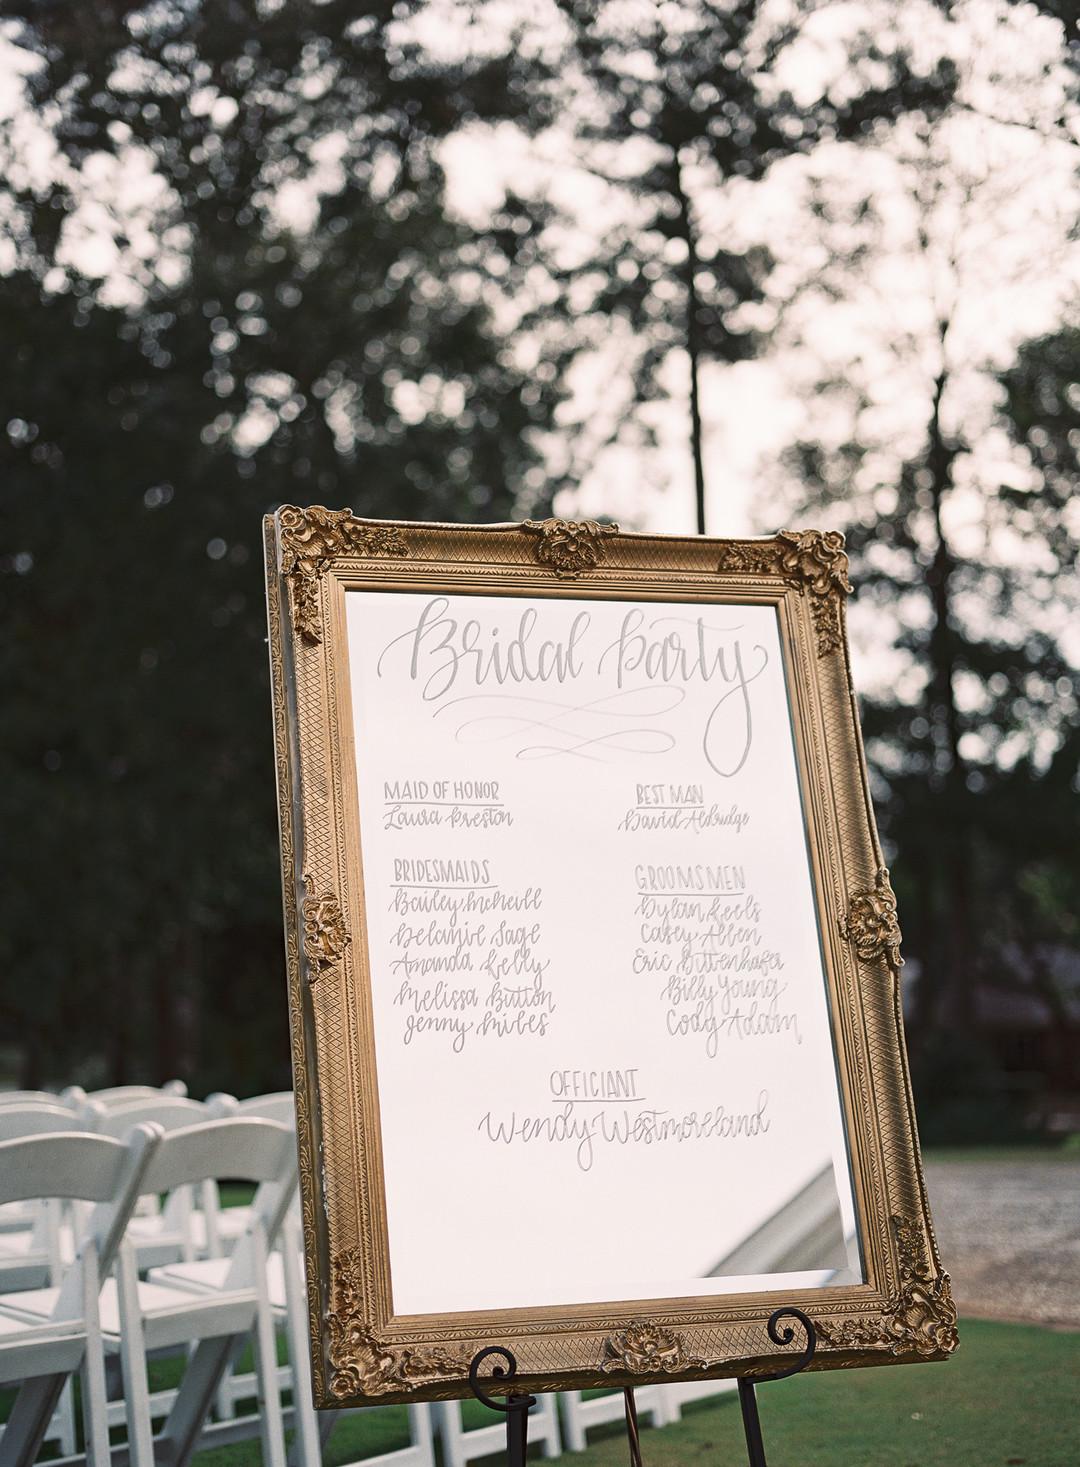 pawleys-plantation-wedding-10.jpg